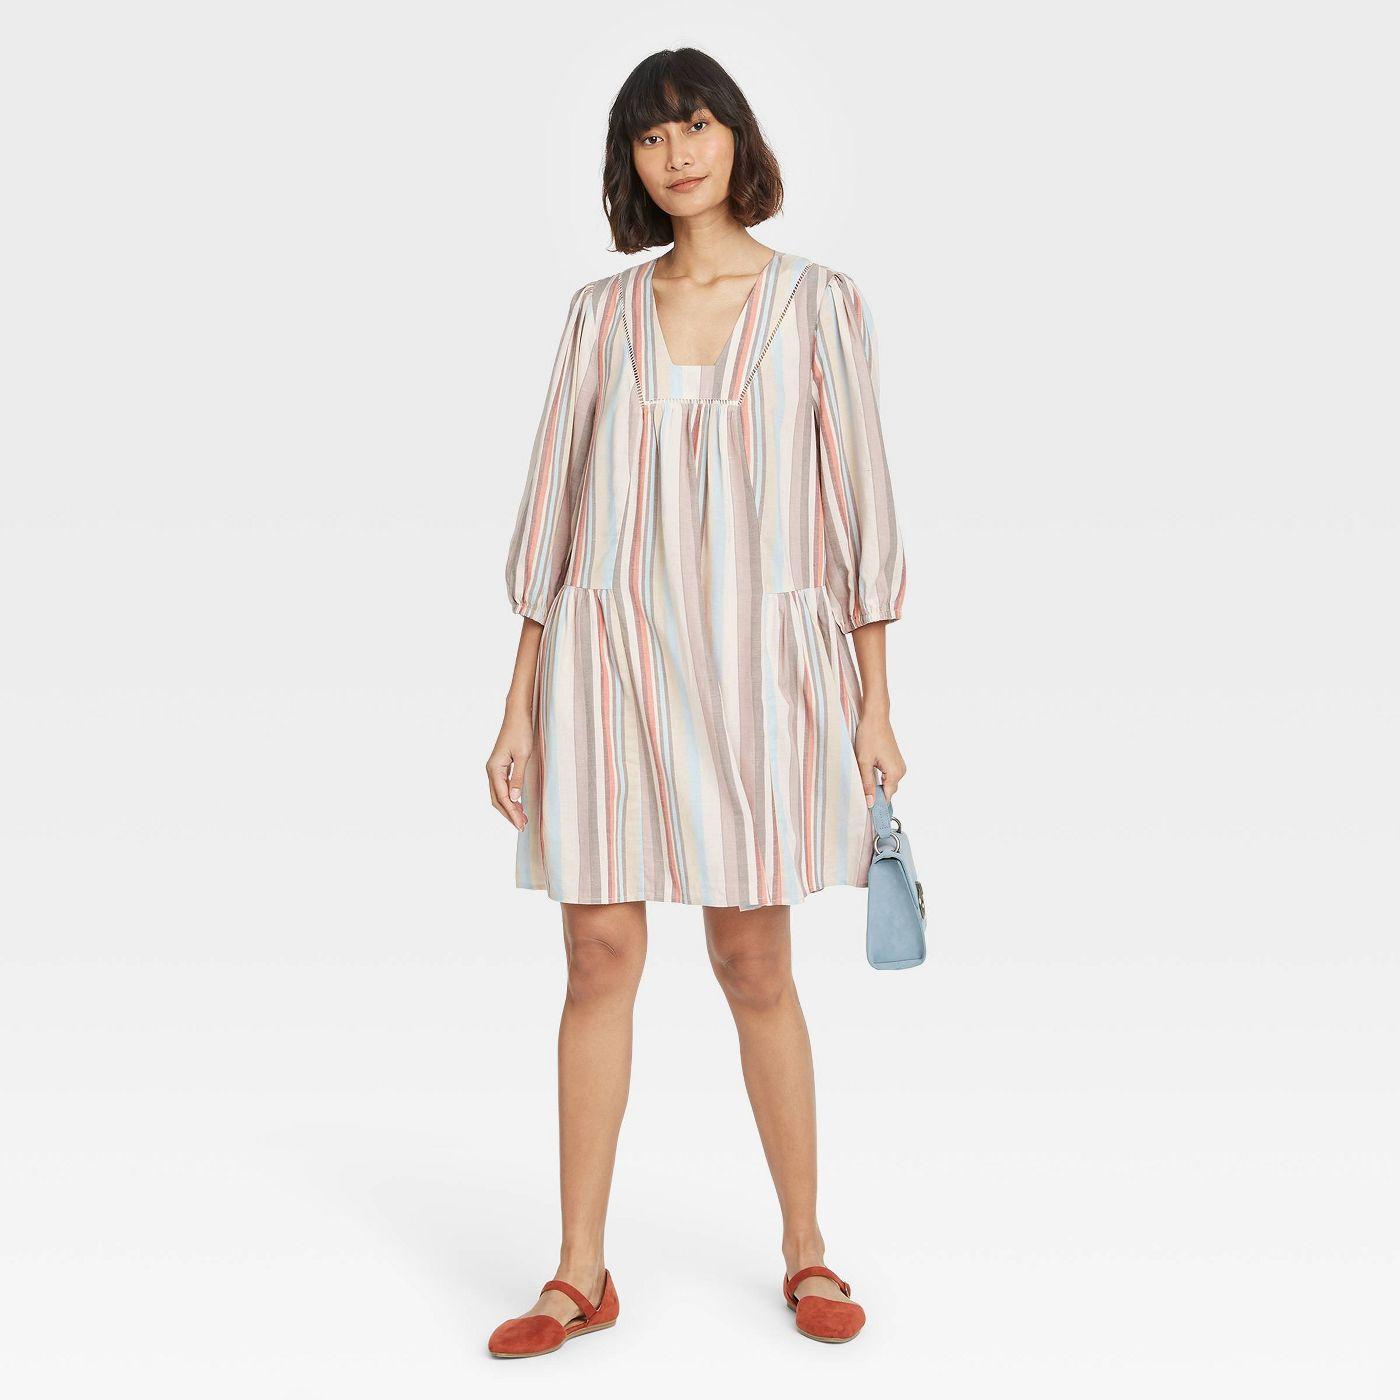 Women's Long Sleeve Shift Dress - Knox Rose™ - image 1 of 8